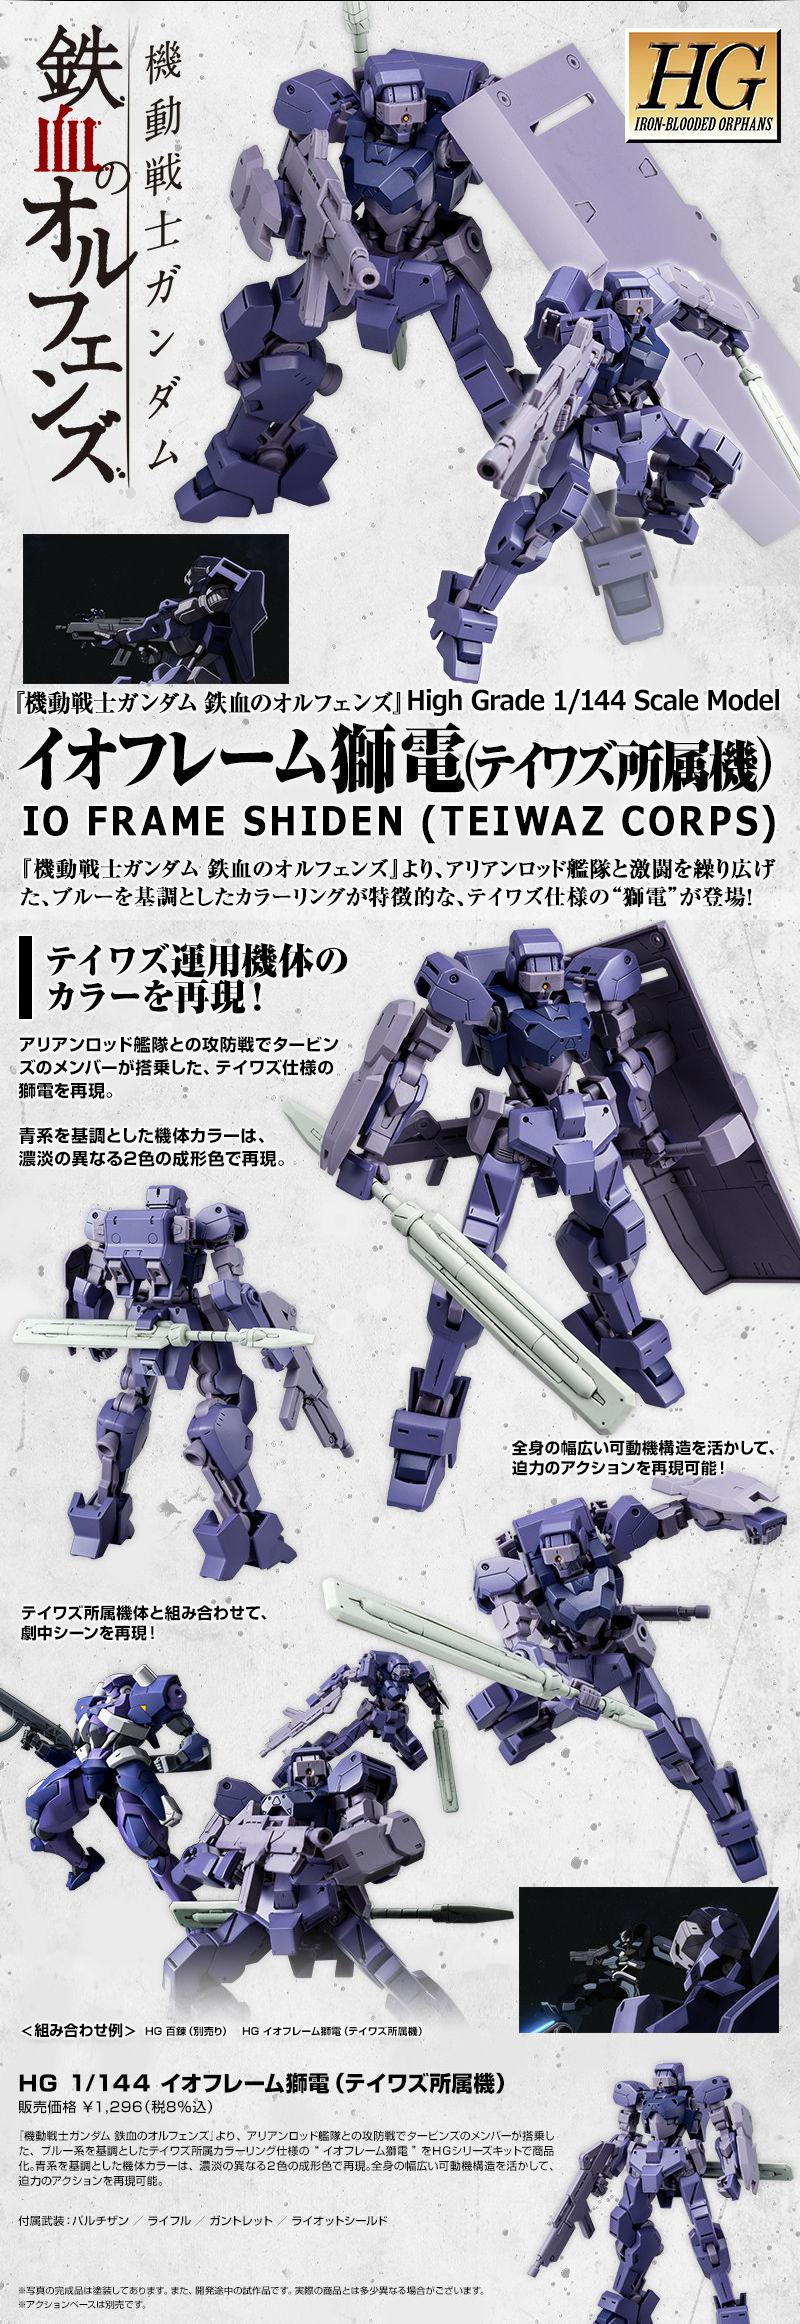 HG 1/144 イオフレーム獅電 (テイワズ所属機) [IO Frame Shiden (Teiwaz Corps)] JAN:4549660283324 公式商品説明(画像)